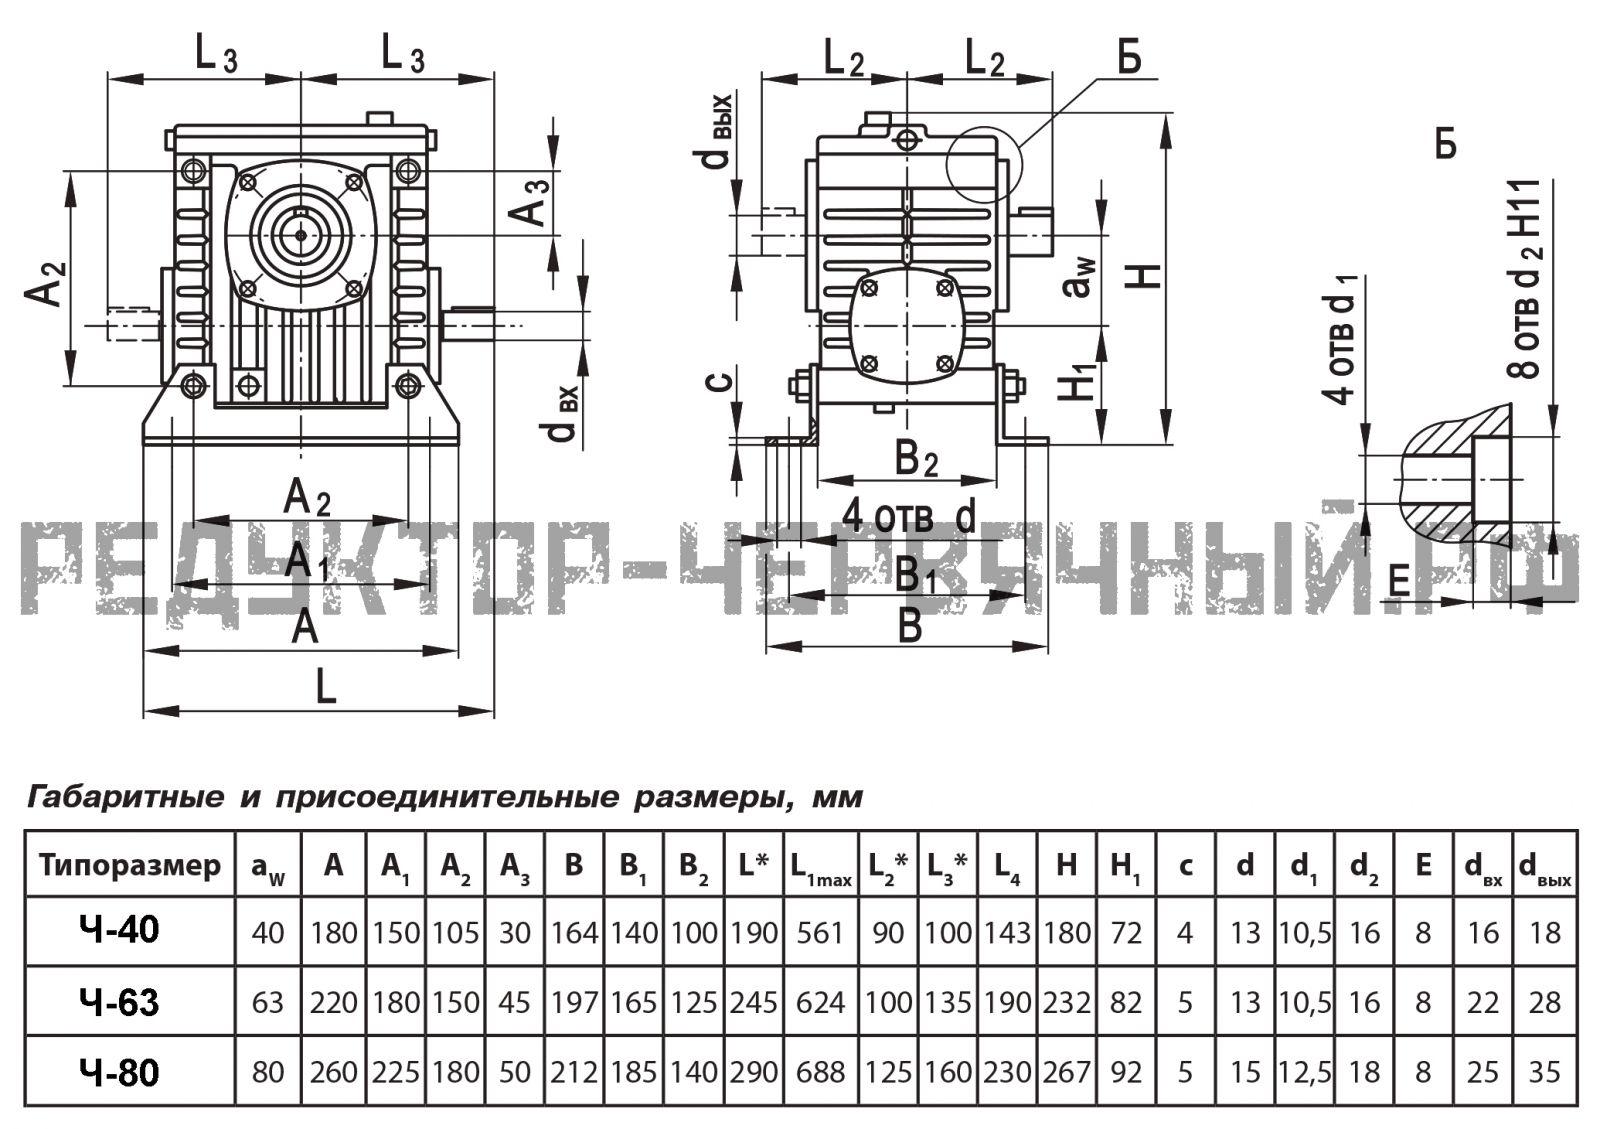 Чертеж редукторов Ч-40, Ч-63, Ч-80